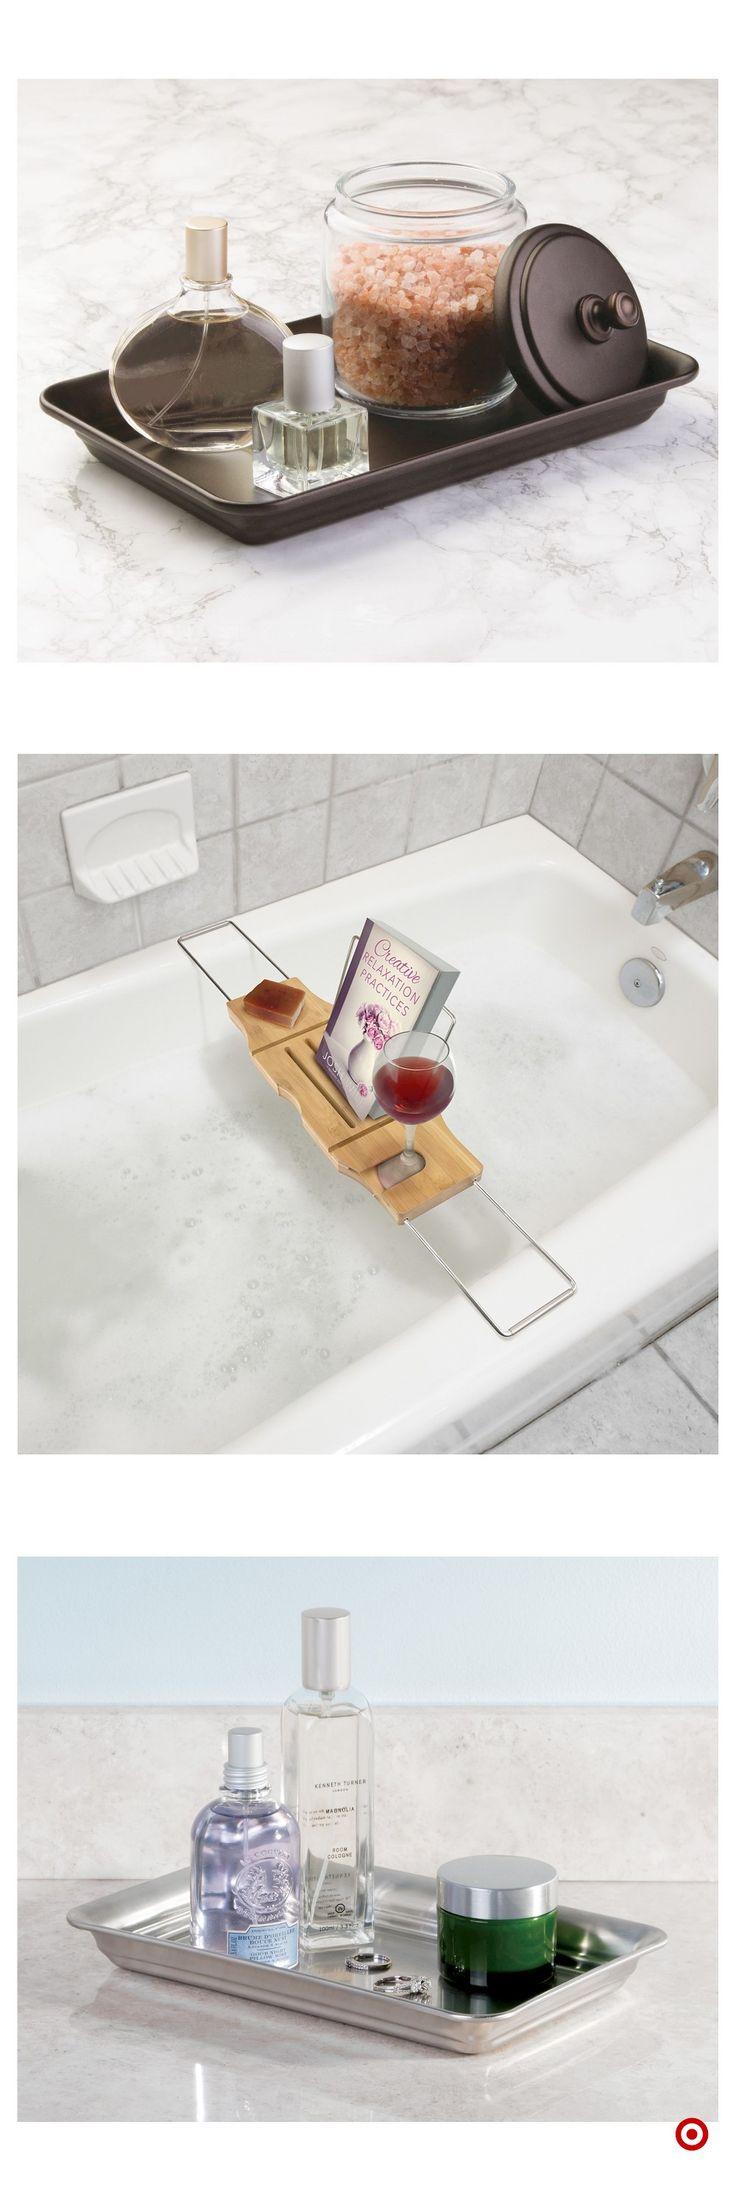 Best 25 Bathroom Tray Ideas On Pinterest Bathroom Sink